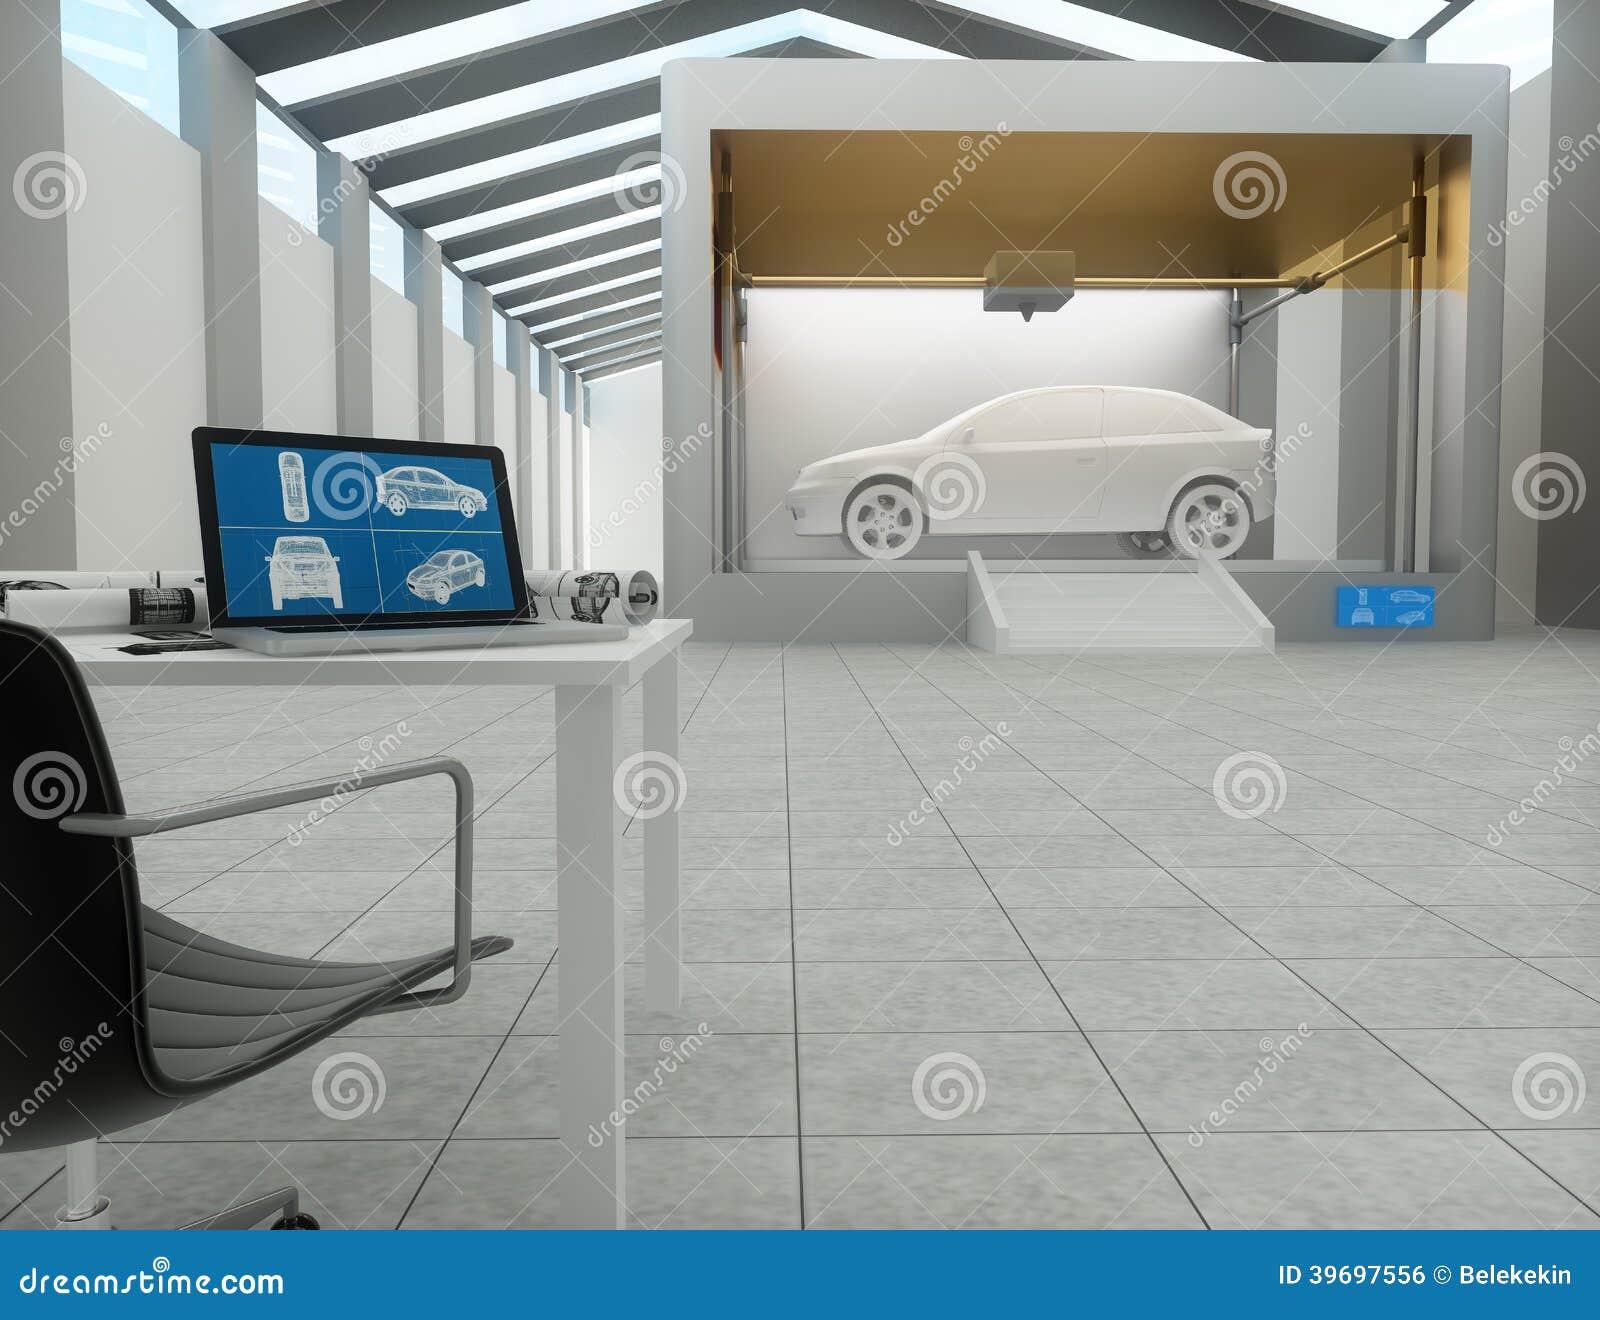 3d Printer, Printing Car Stock Illustration. Illustration